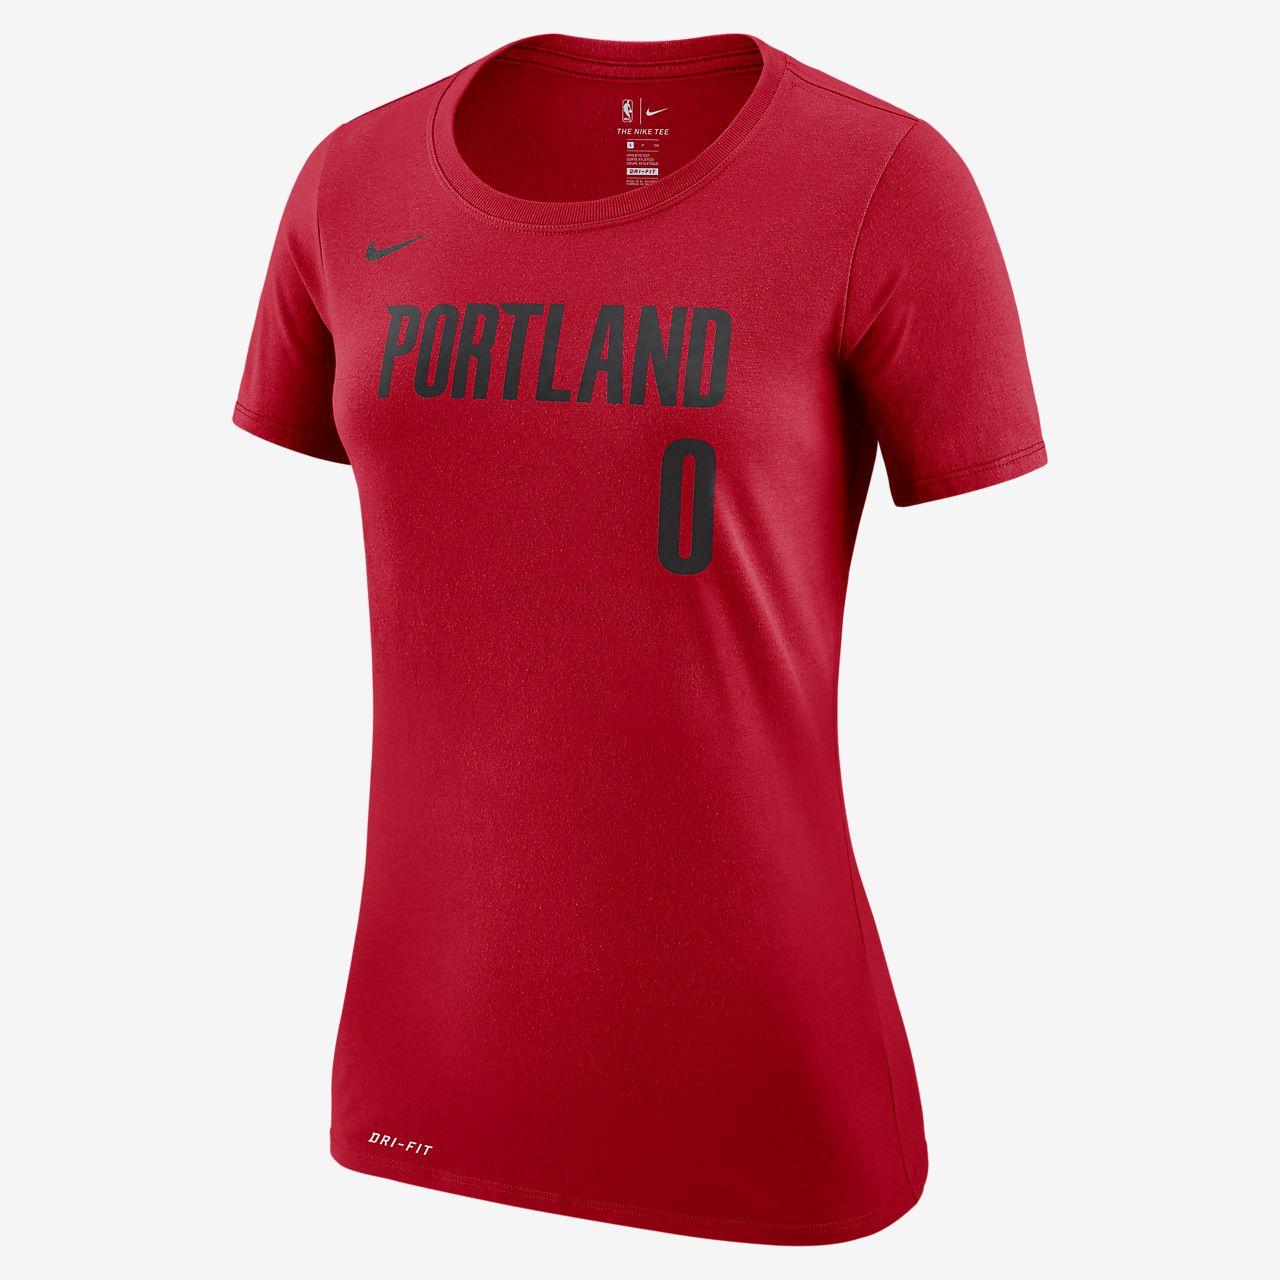 Portland Trail Blazers Media Guide: Damian Lillard Portland Trail Blazers Nike Dri-FIT Women's